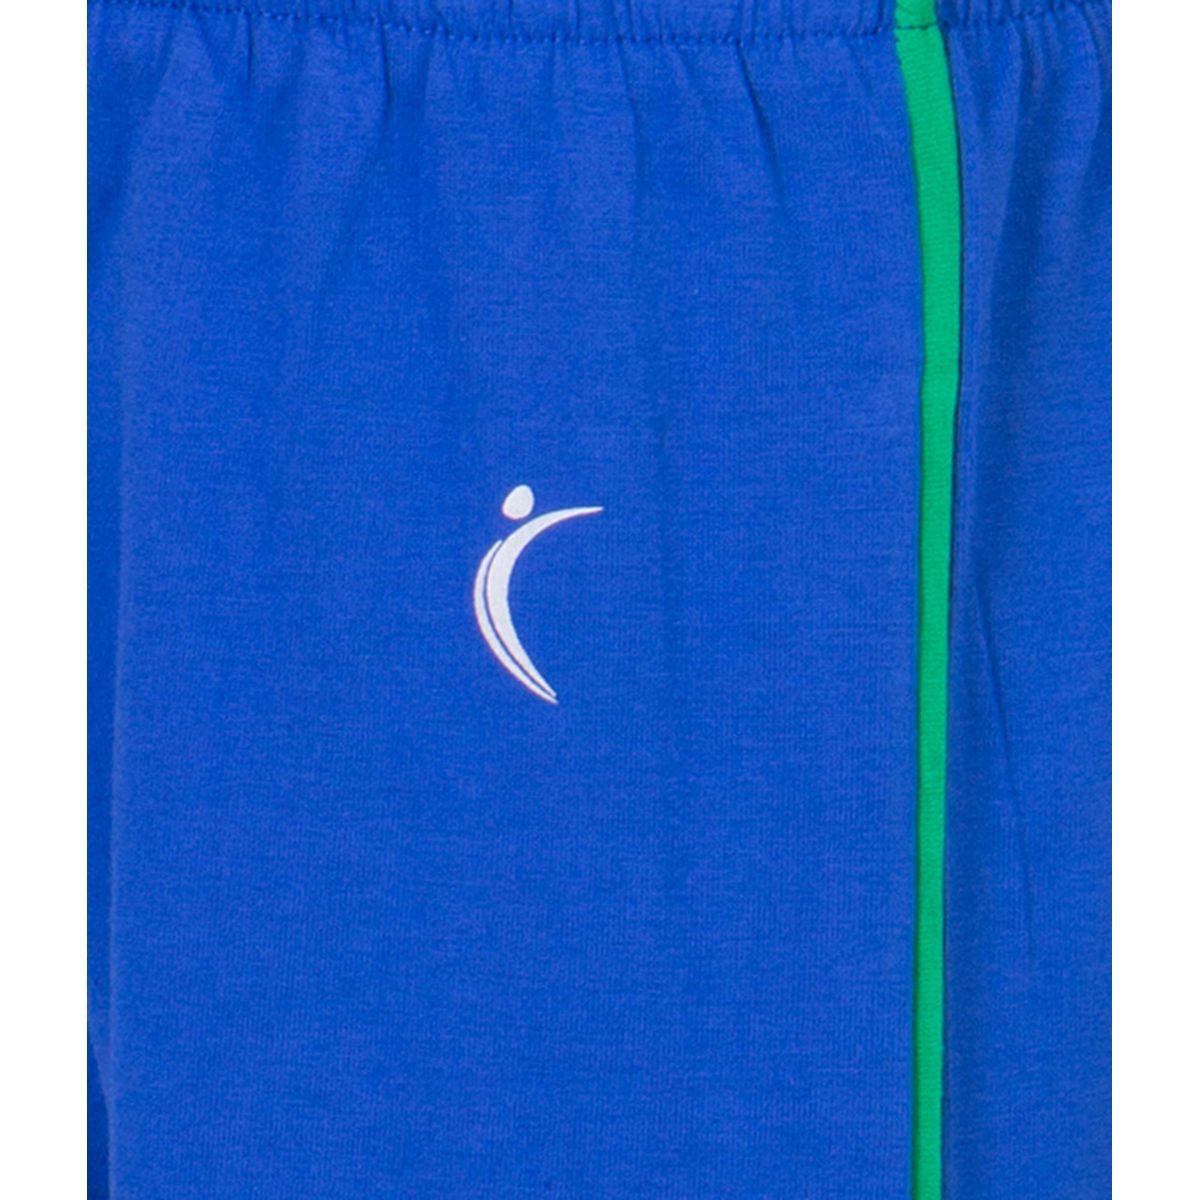 Ultrafit Junior Boys Cotton Blue Track Pant251